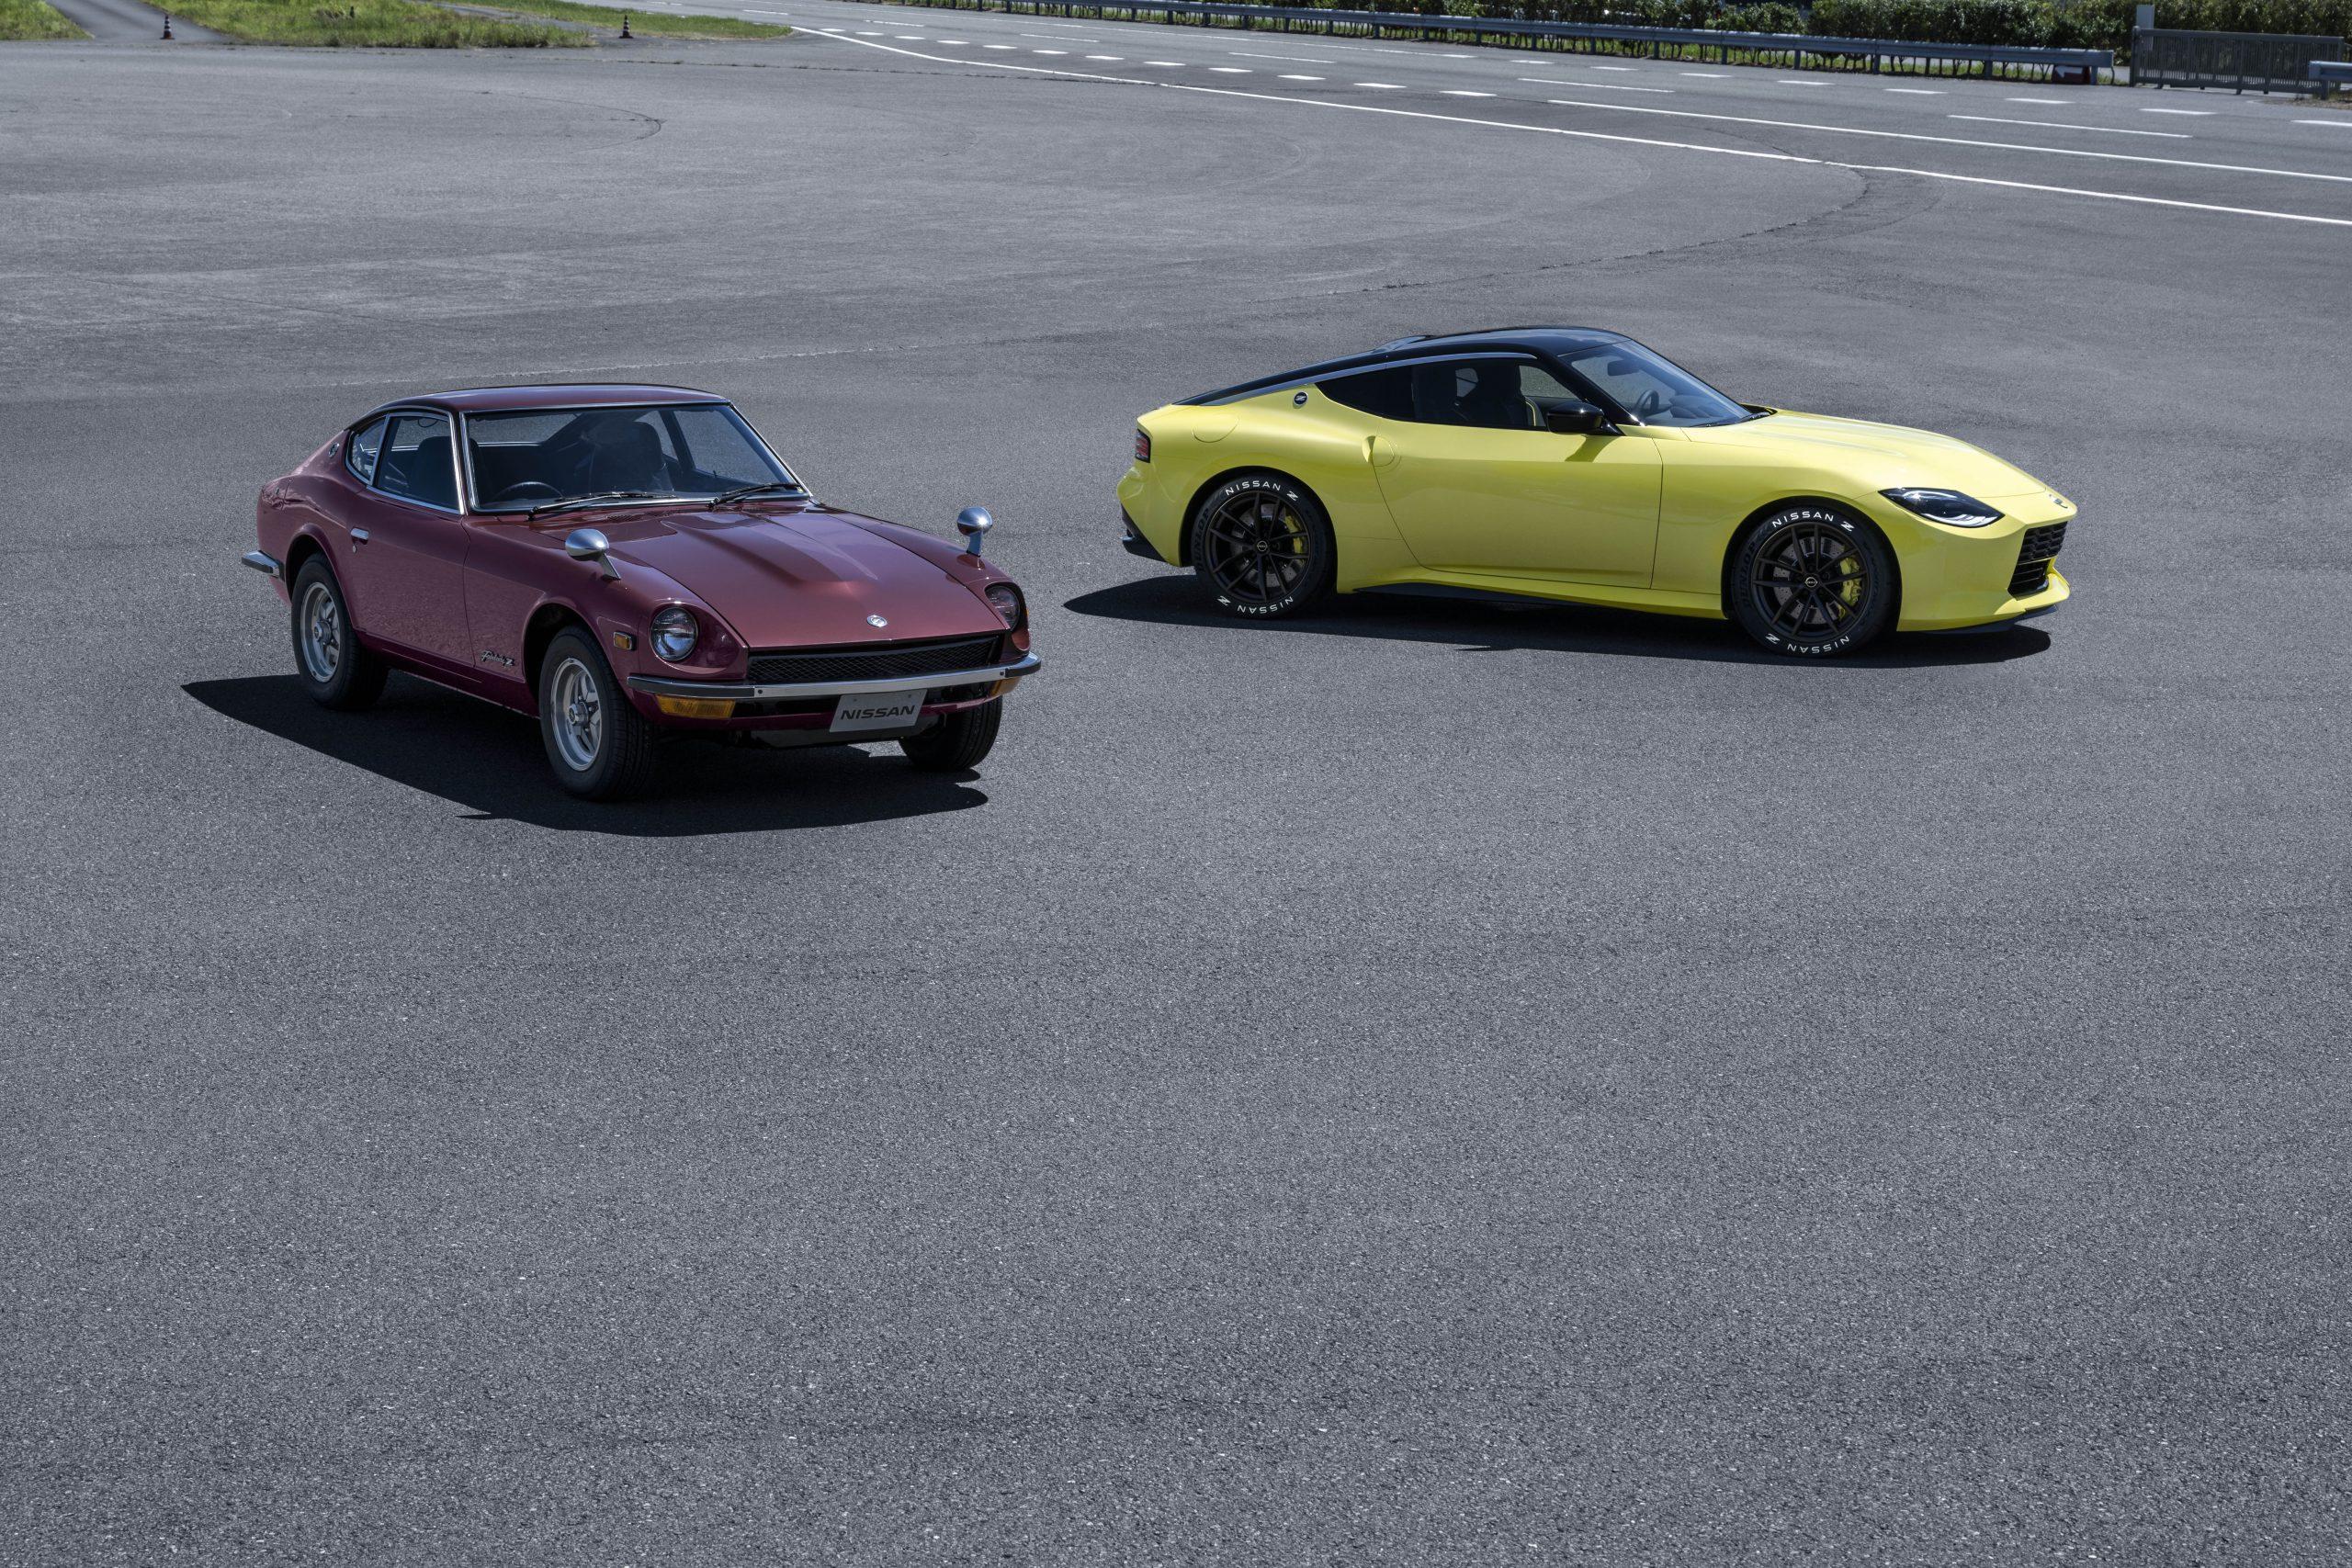 nissan new z car prototype beside datsun 240z